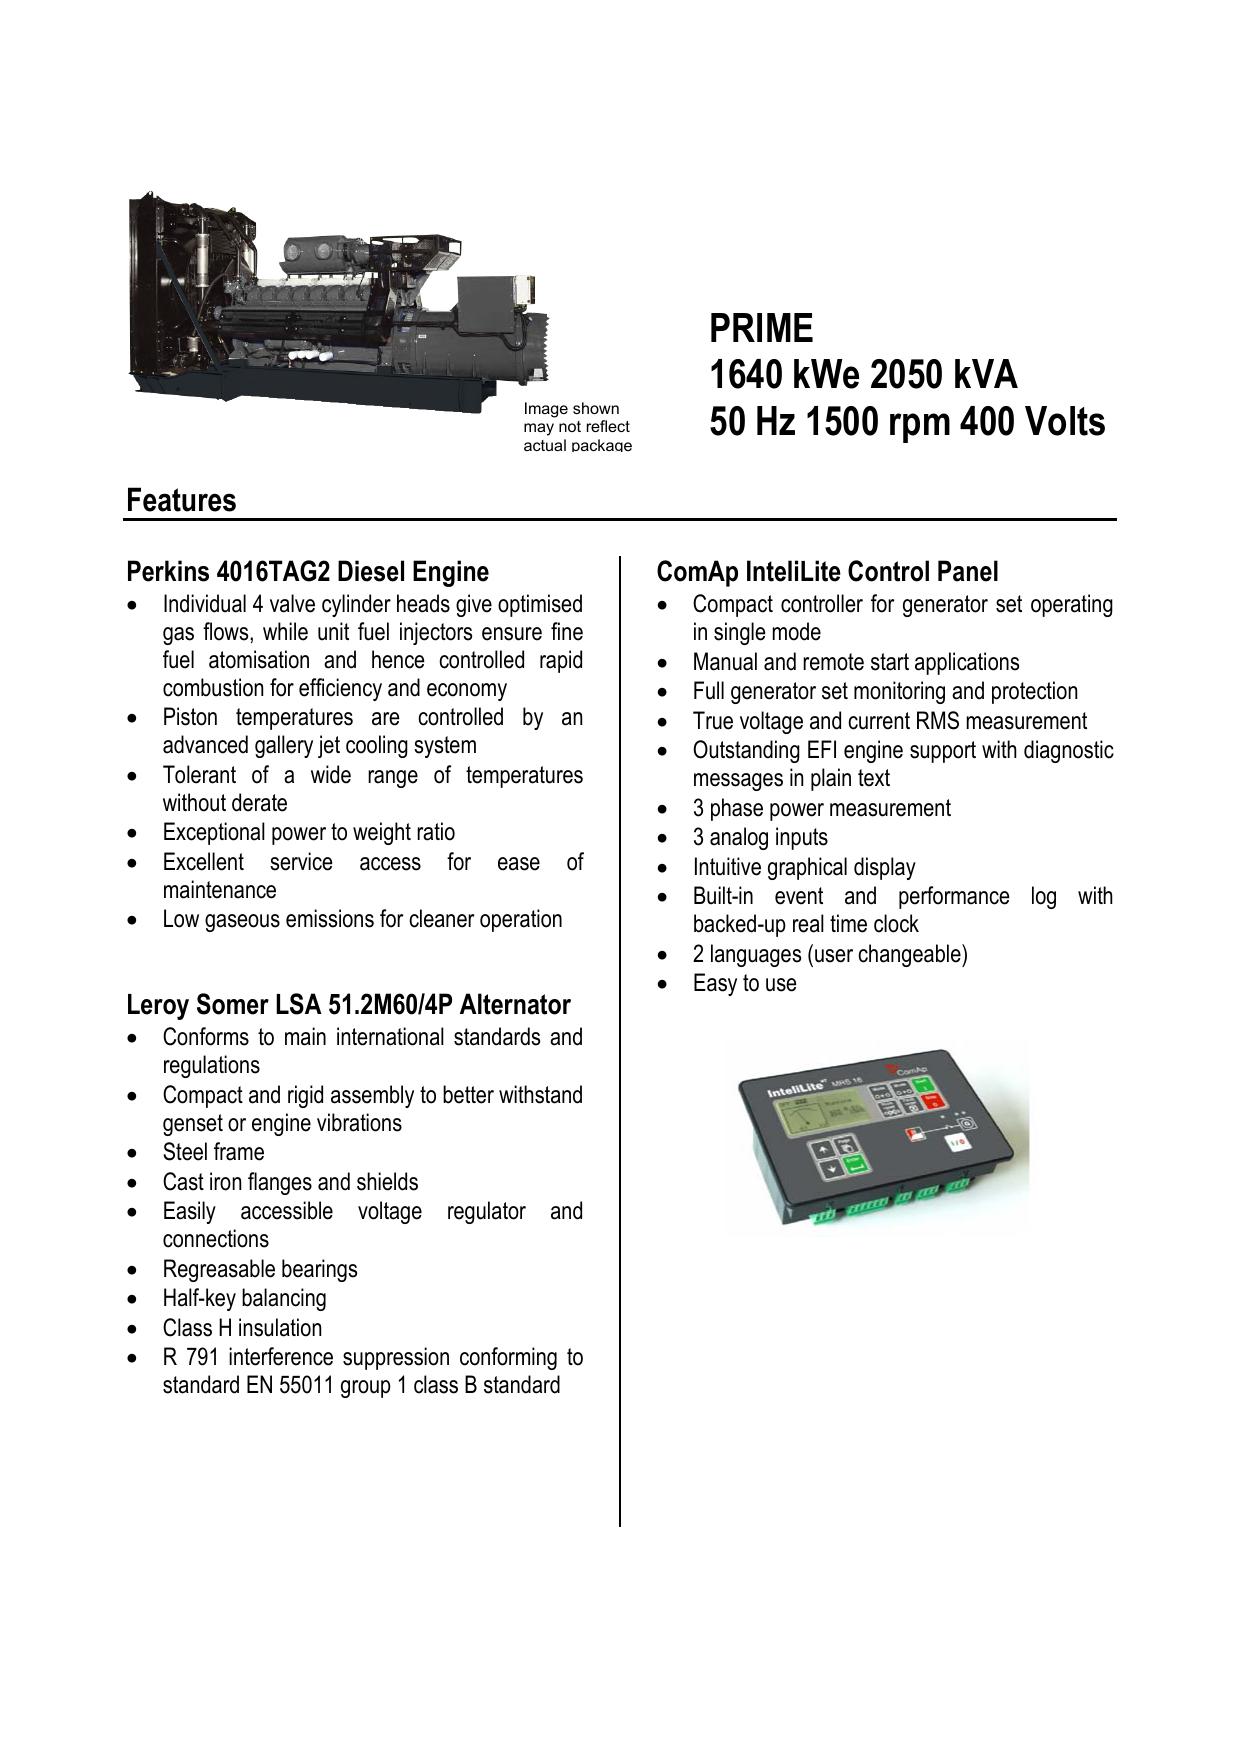 PRIME 1640 kWe 2050 kVA 50 Hz 1500 rpm 400 Volts | manualzz com